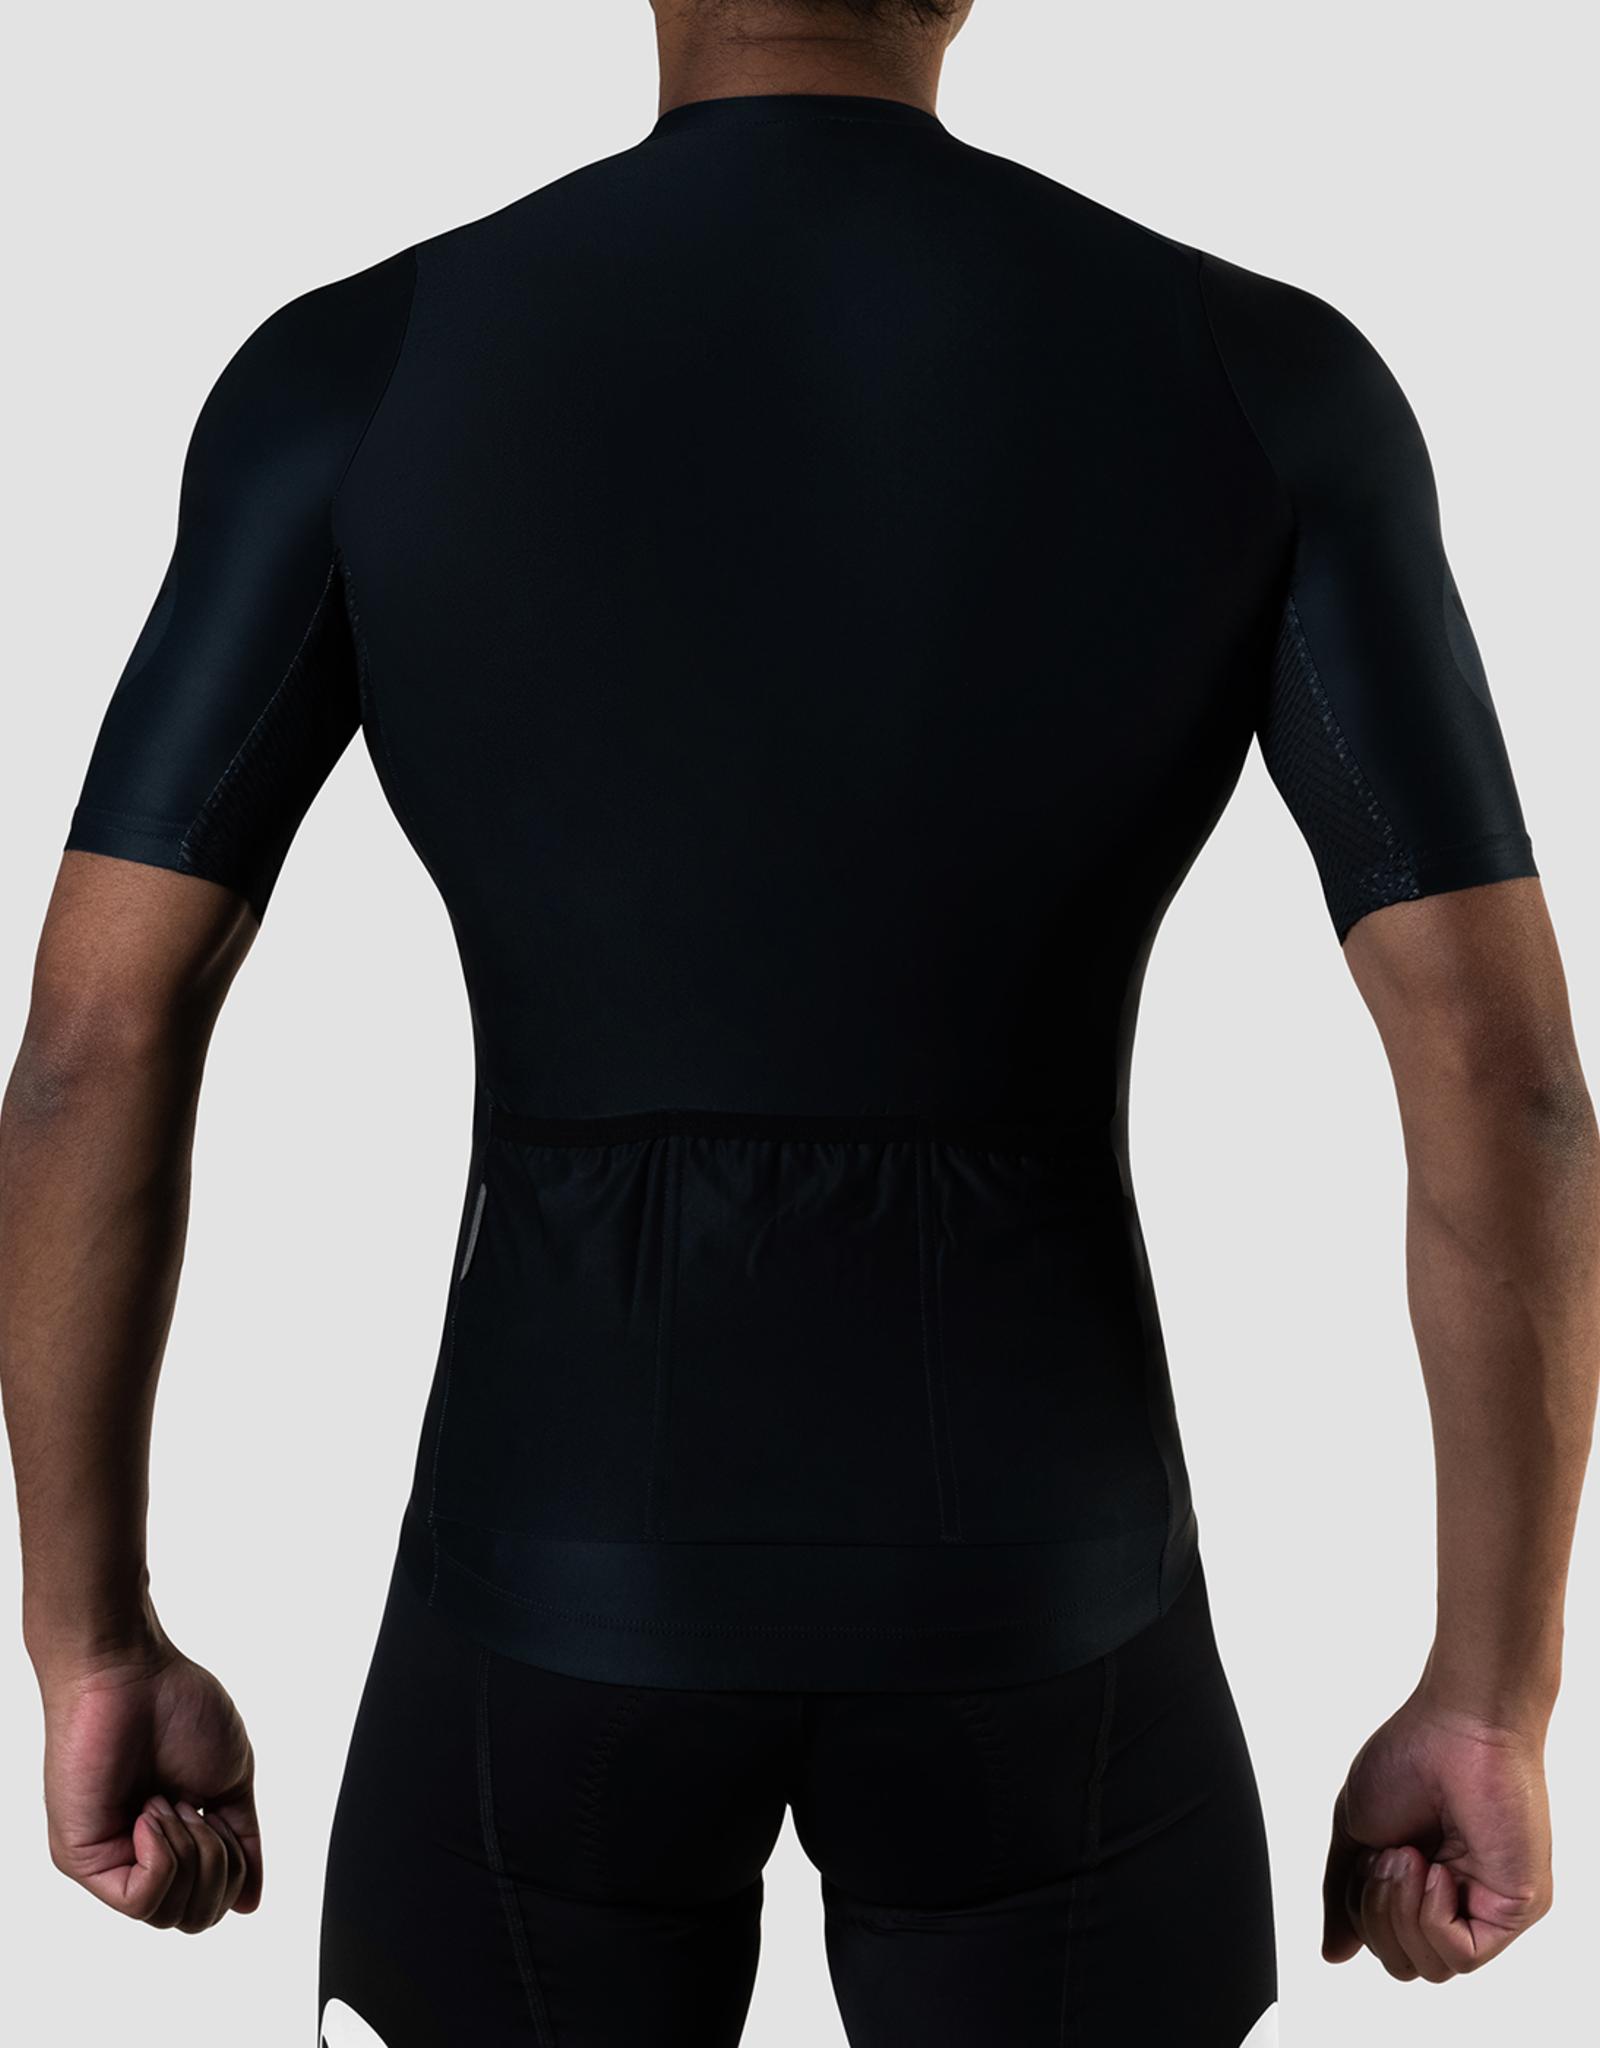 Black Sheep Cycling Men's TEAM jersey - Block Midnight